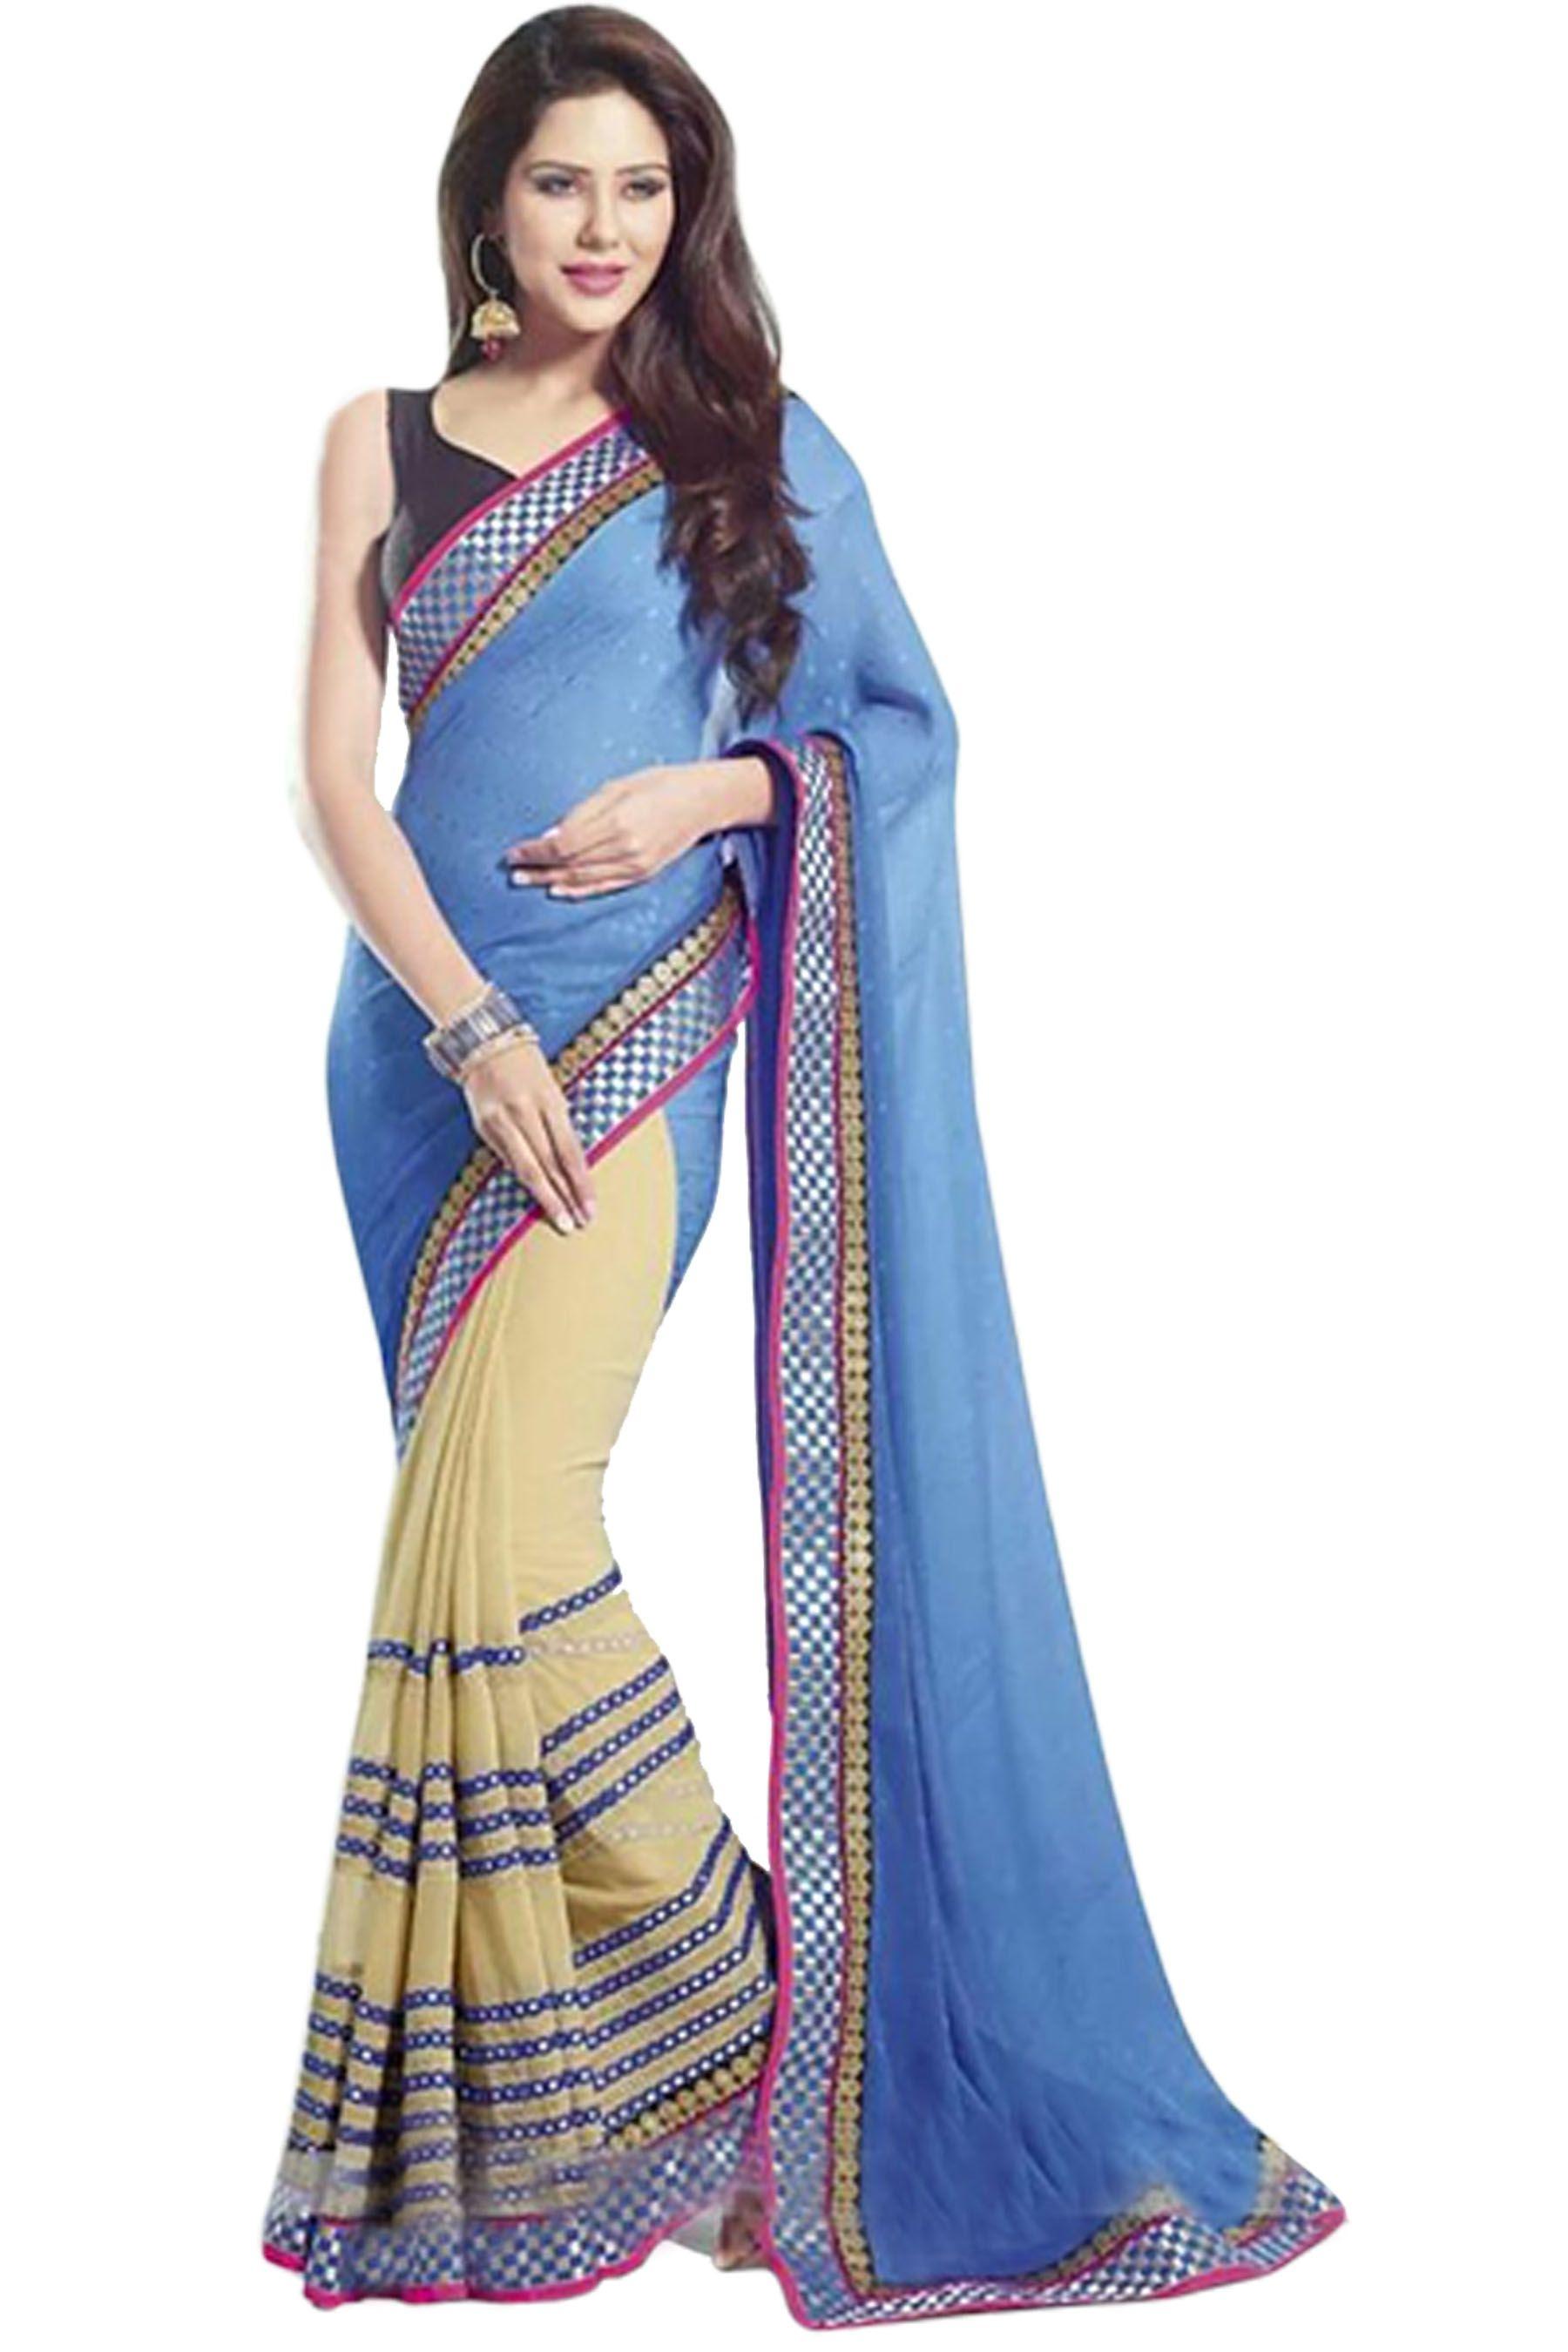 Laxmipati Fashion Blue Georgette Saree